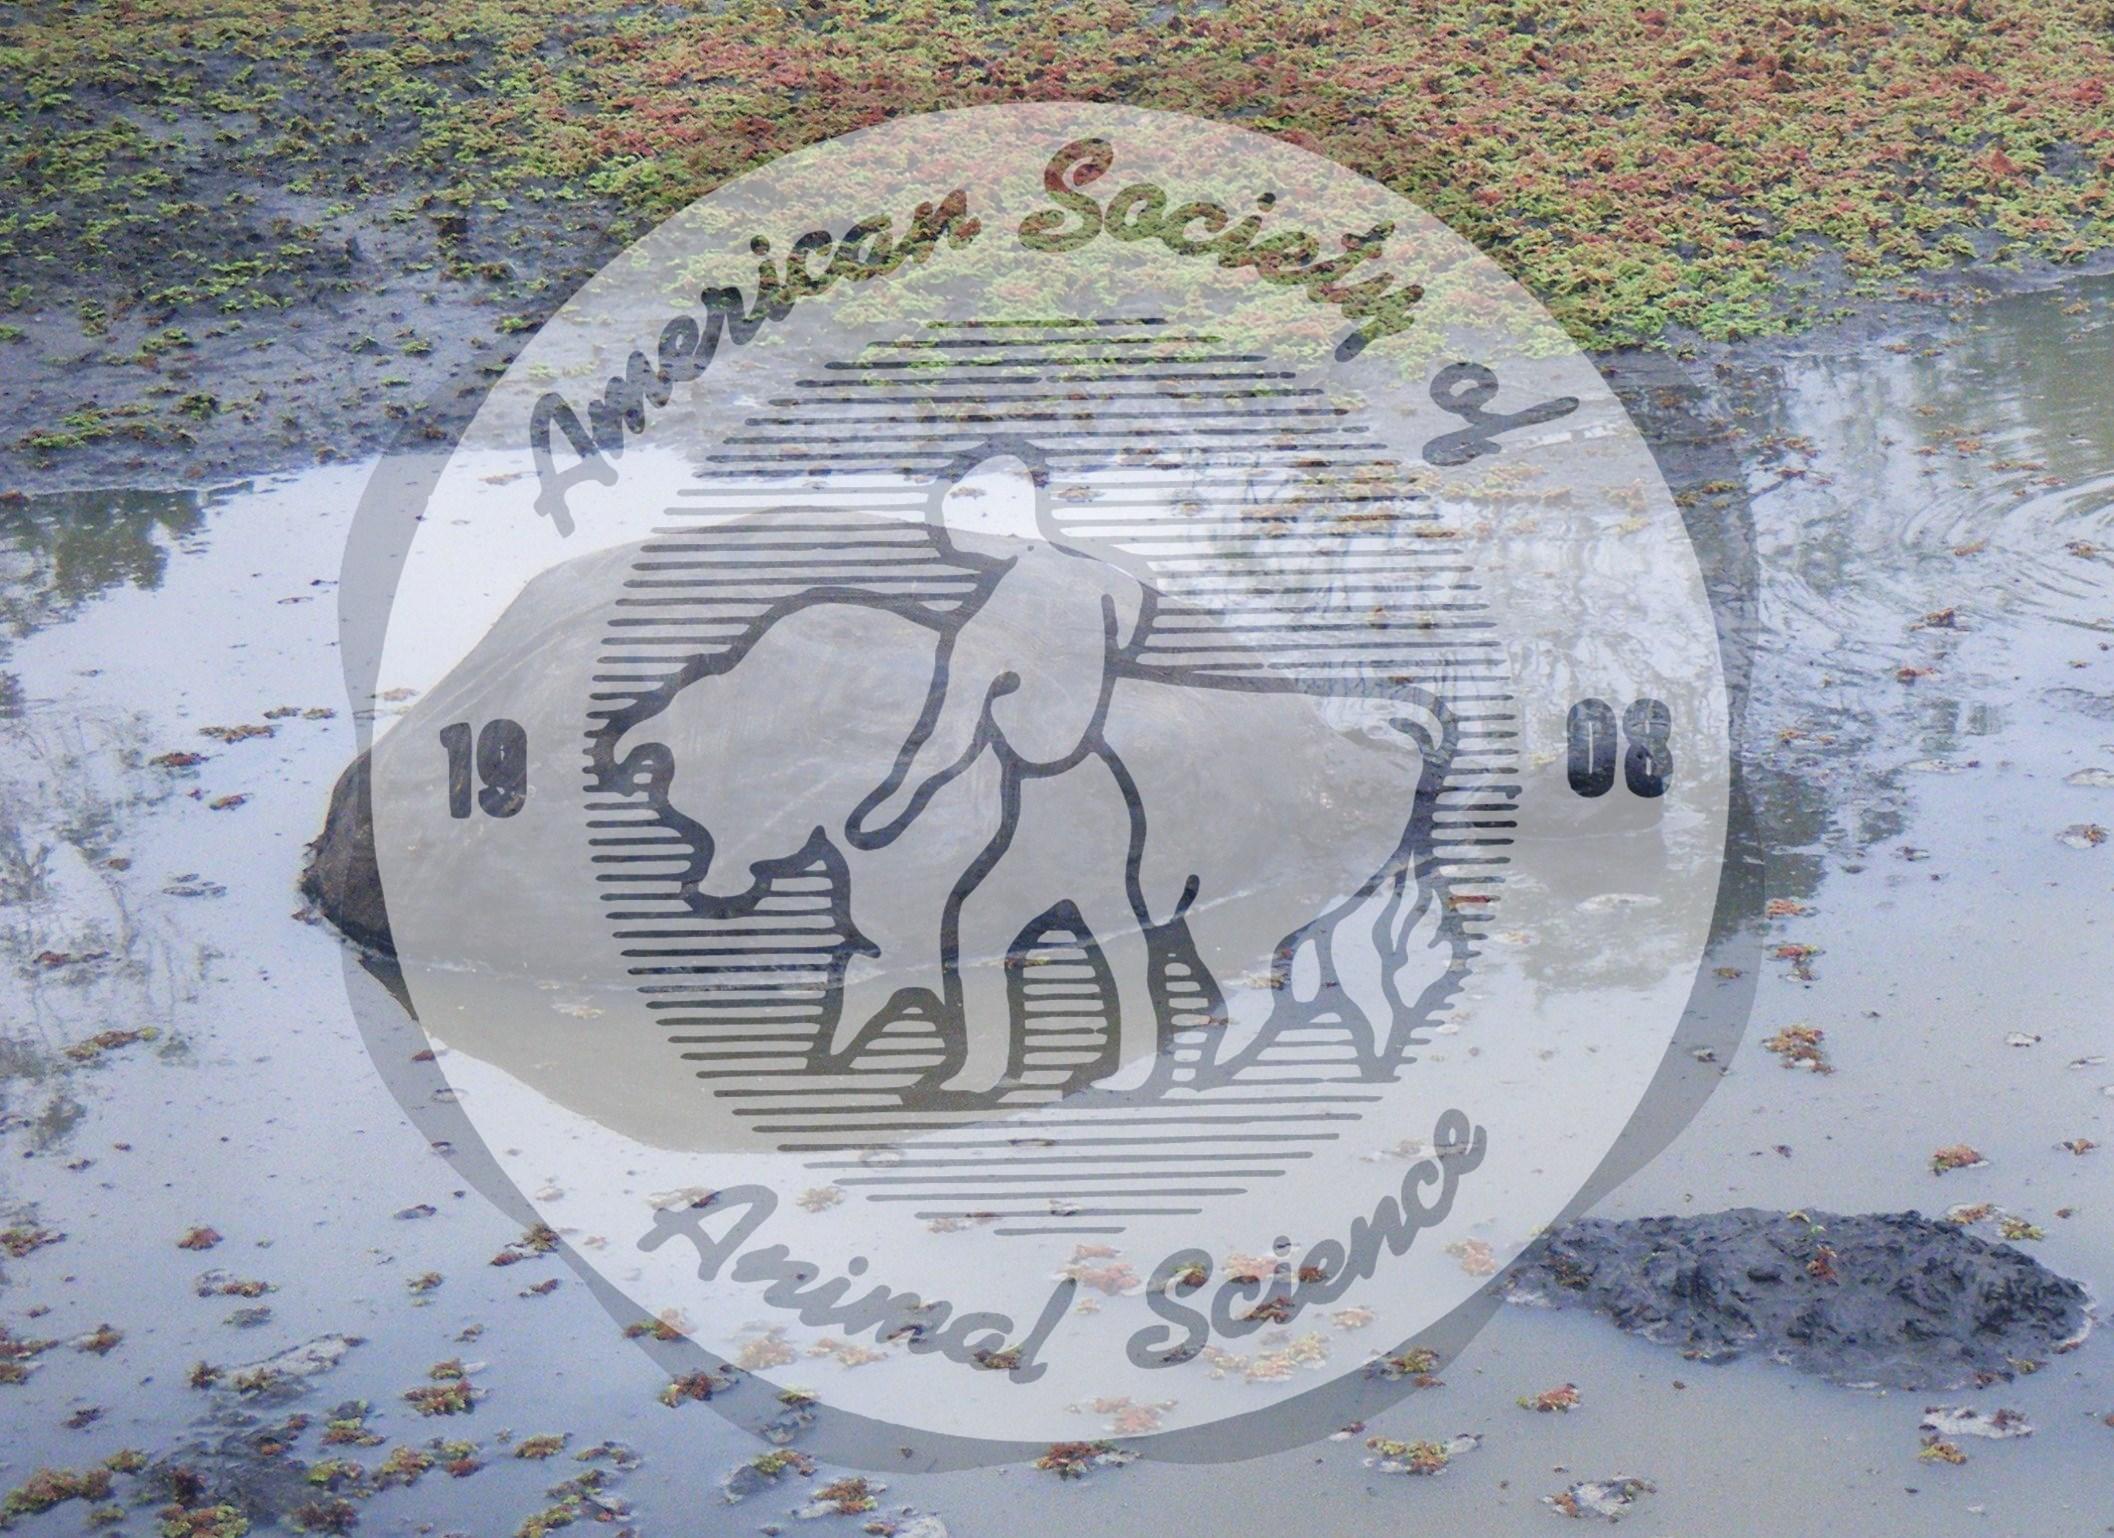 Giant tortoise (Geochelone nigra) wallowing in freshwater pool in Rancho Primicias Tortoise Reserve, Santa Cruz island, Galapagos Archipelago. Tortoises use these mud wallows to keep cool.